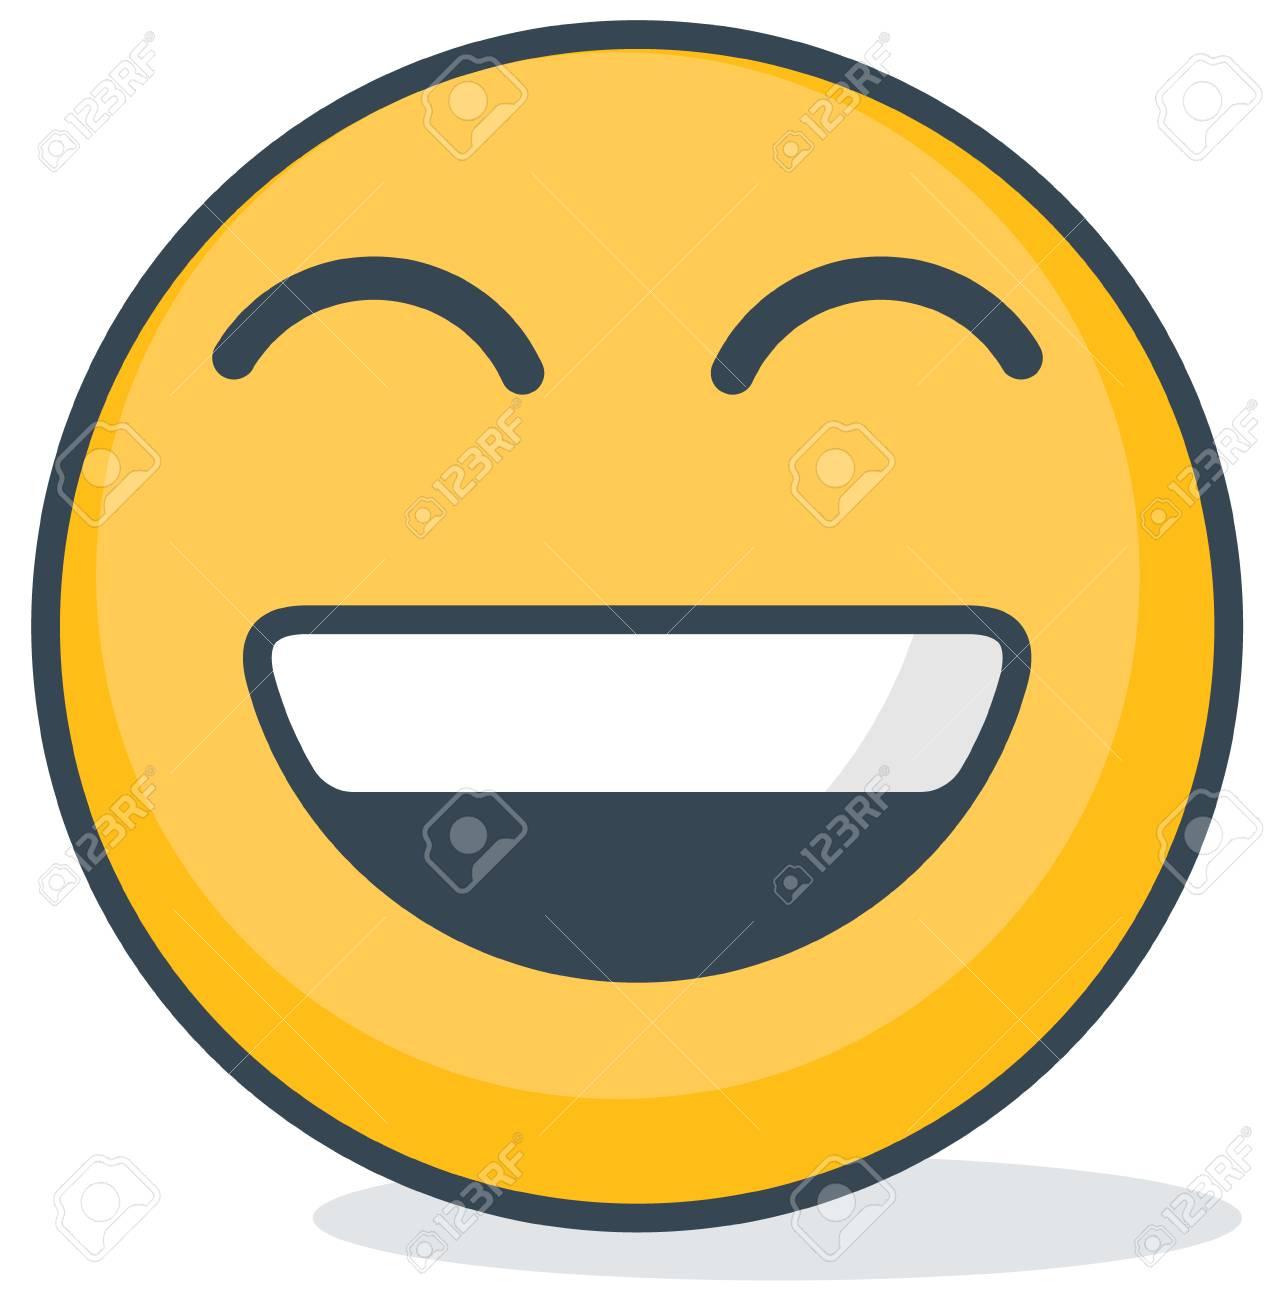 Isolated happy emoticon. Isolated emoticon. - 98622751